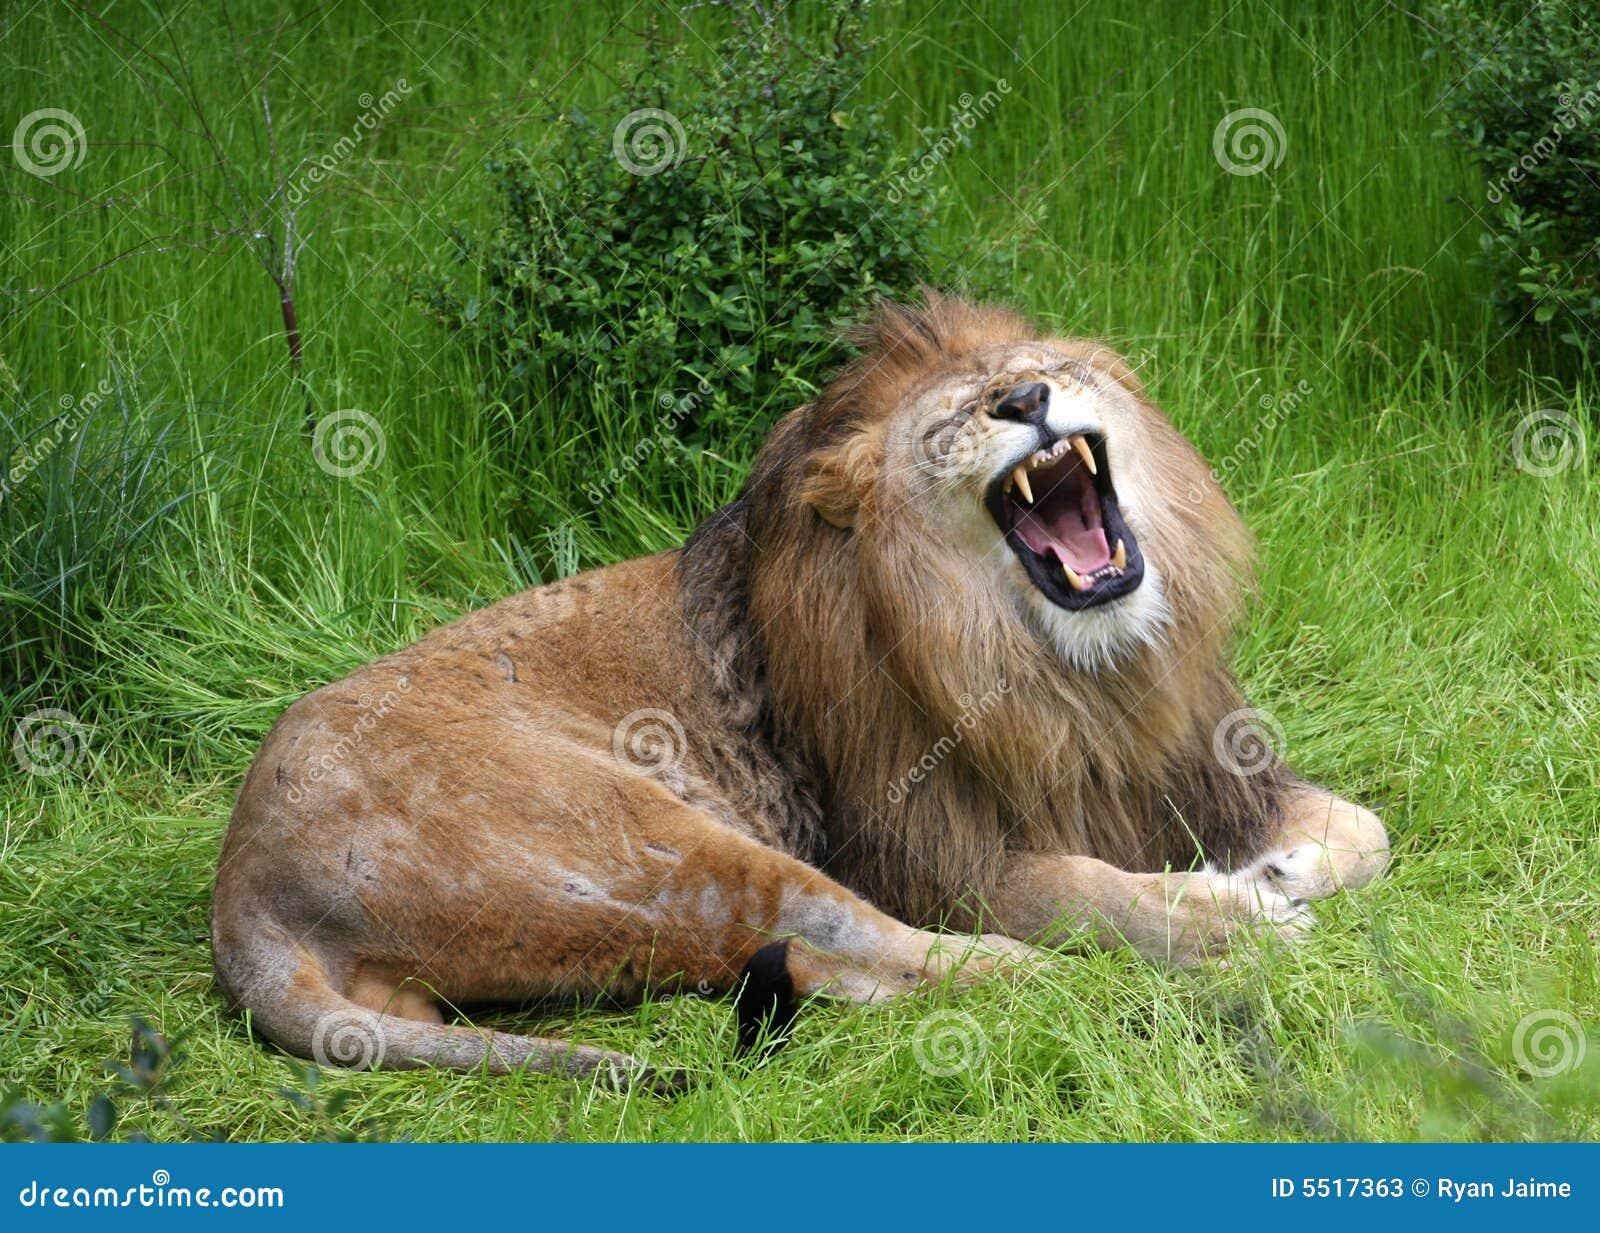 Lions Roar Stock Photos - Image: 5517363 - photo#45